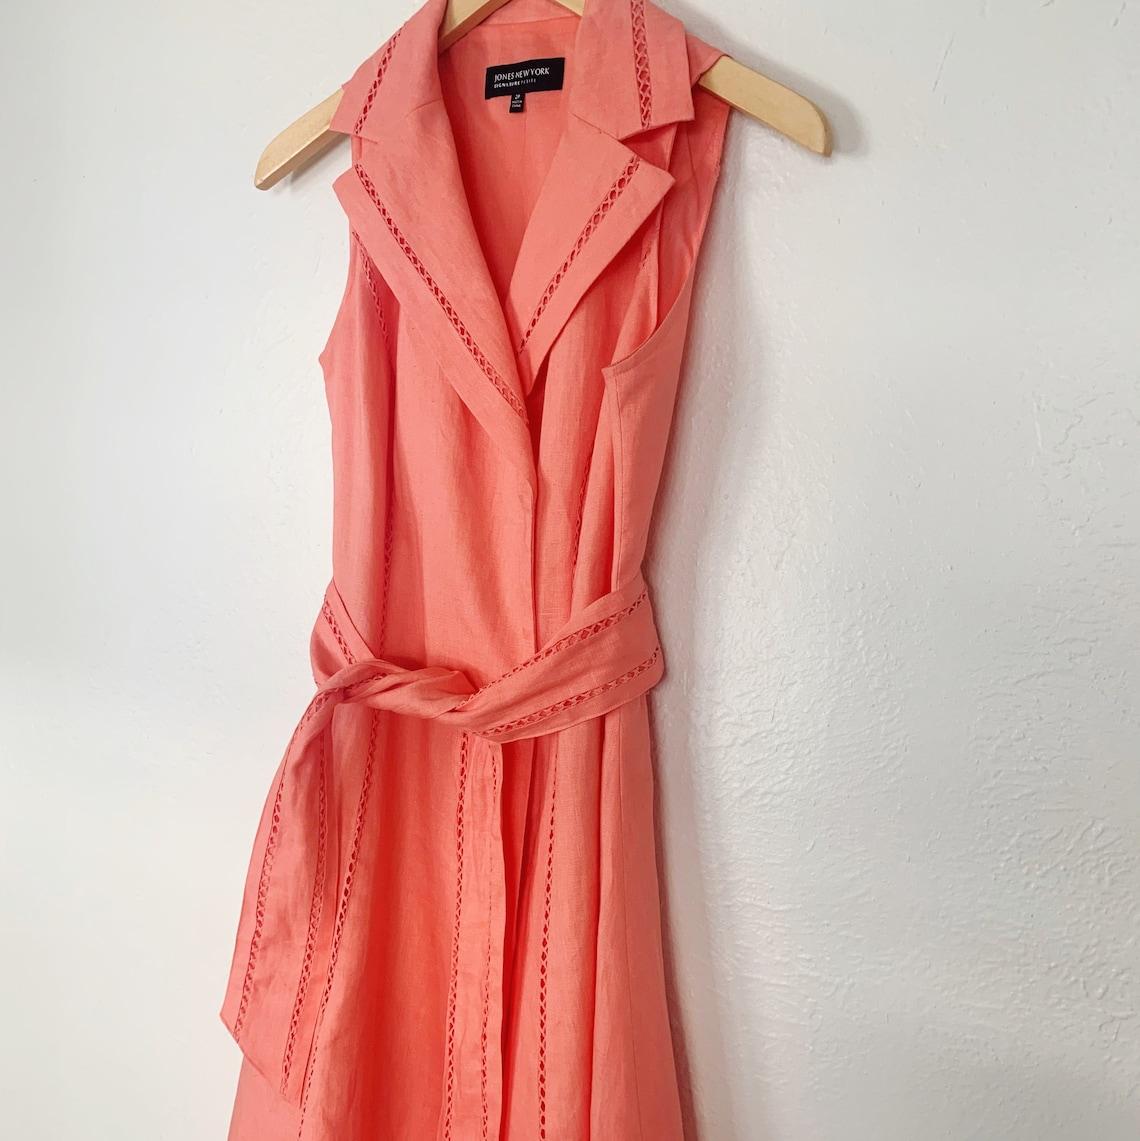 90s Jones New York Peachy Coral Linen Wrap Dress  Small